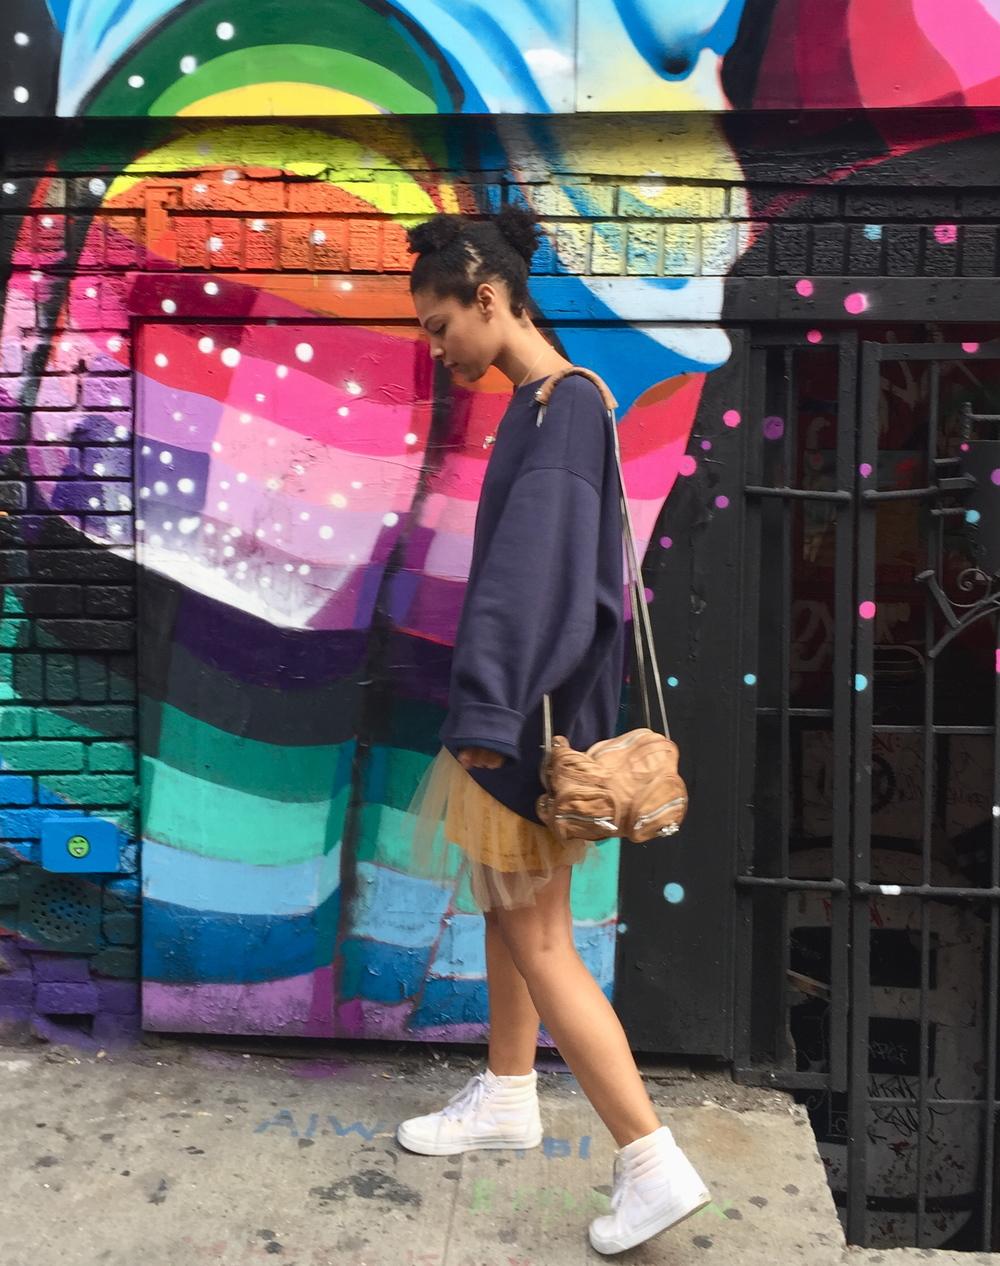 The Style: Acne sweatshirt, Rodarte tulle skirt, white Vanz, Alexander Wang bag, dino hair.